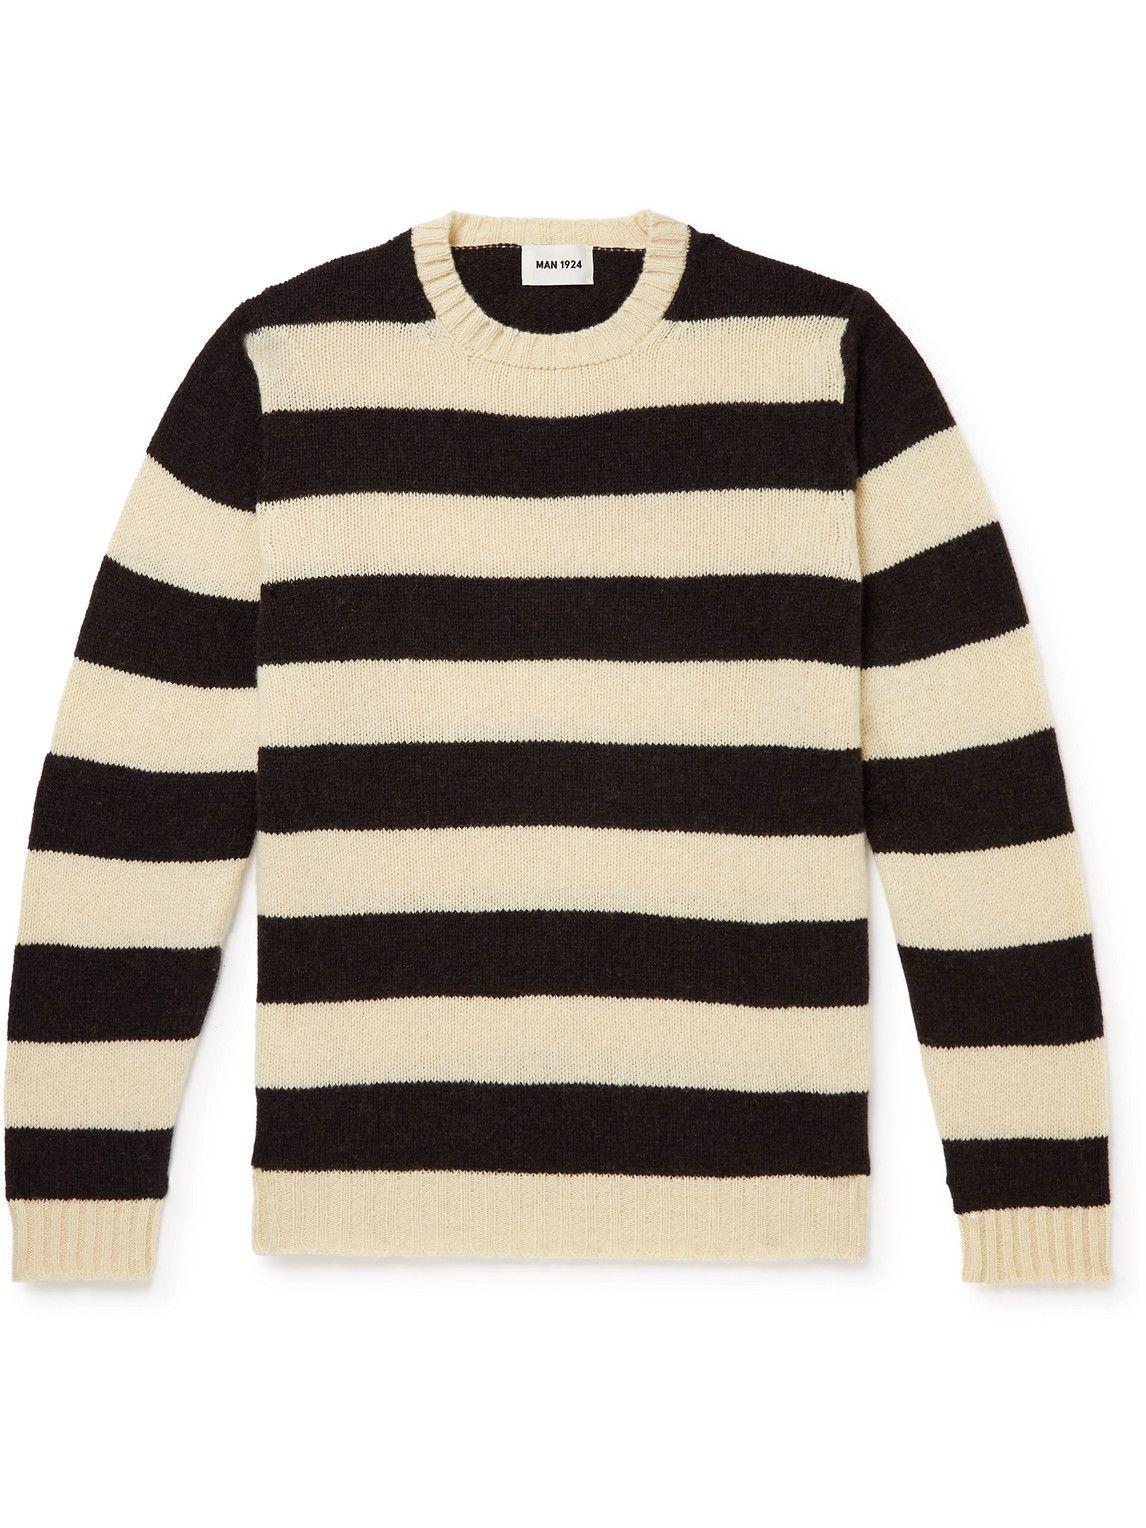 Photo: MAN 1924 - Striped Wool Sweater - Neutrals